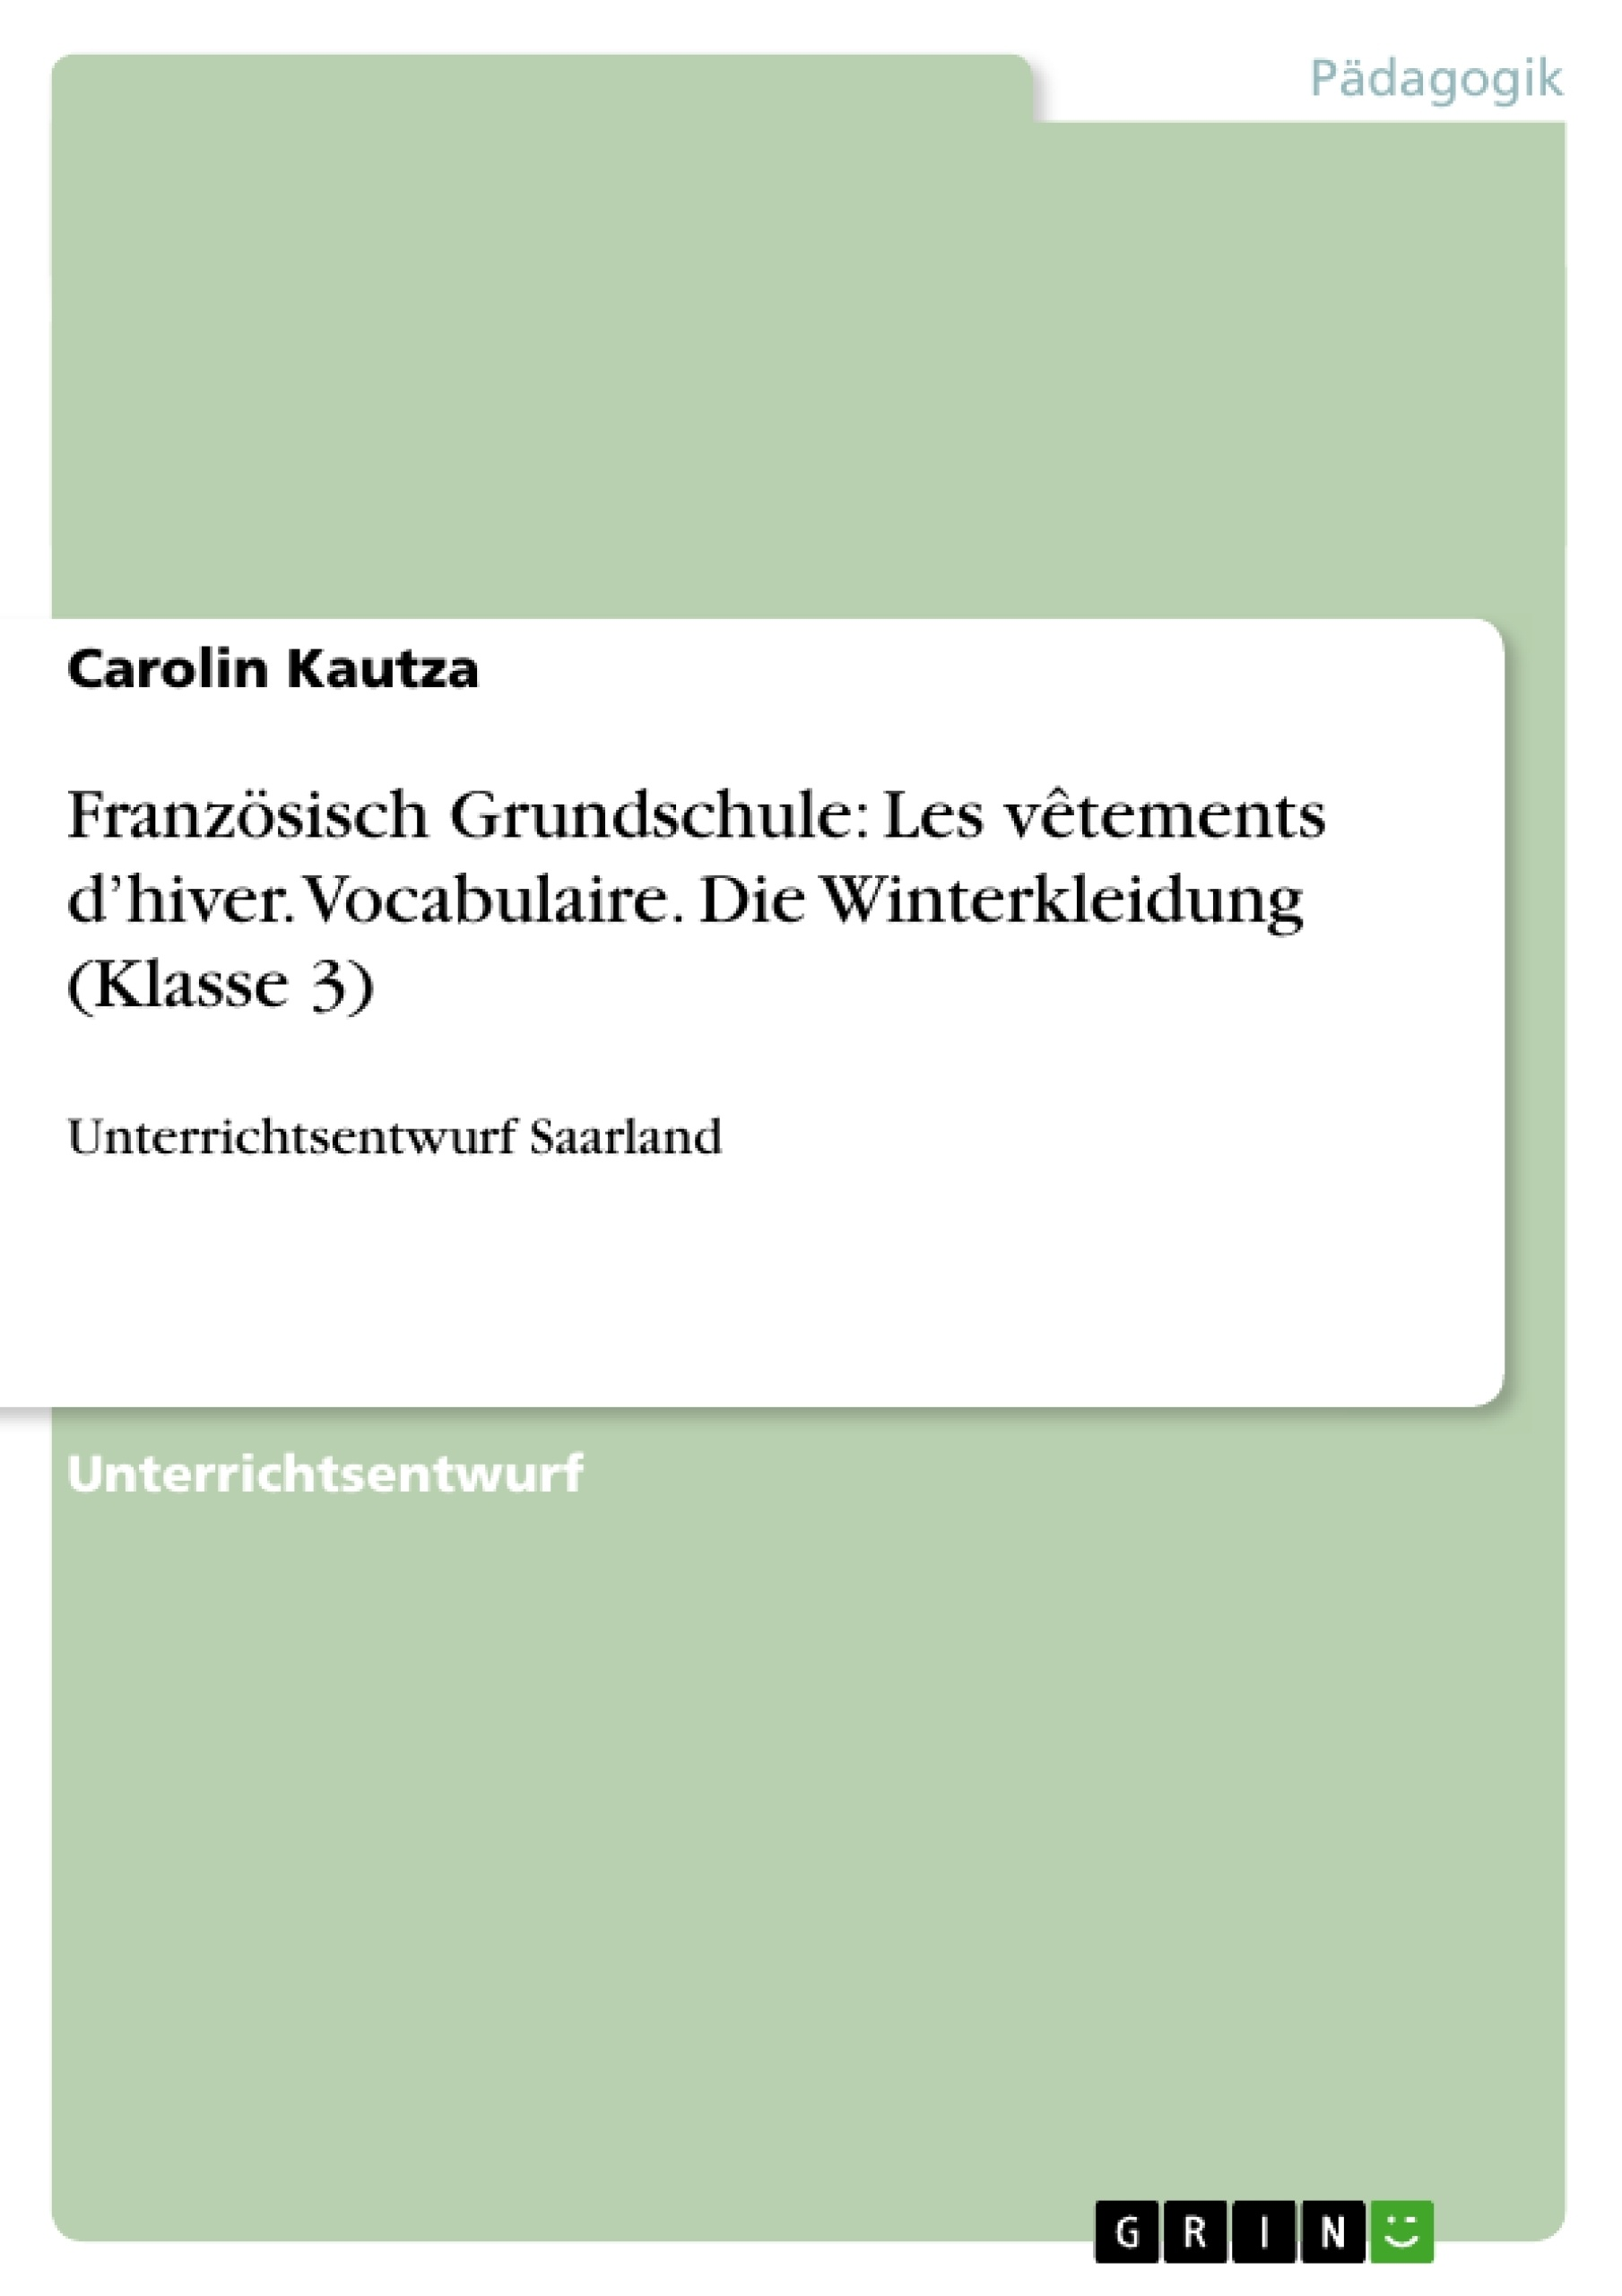 Titel: Französisch Grundschule: Les vêtements d'hiver. Vocabulaire. Die Winterkleidung (Klasse 3)